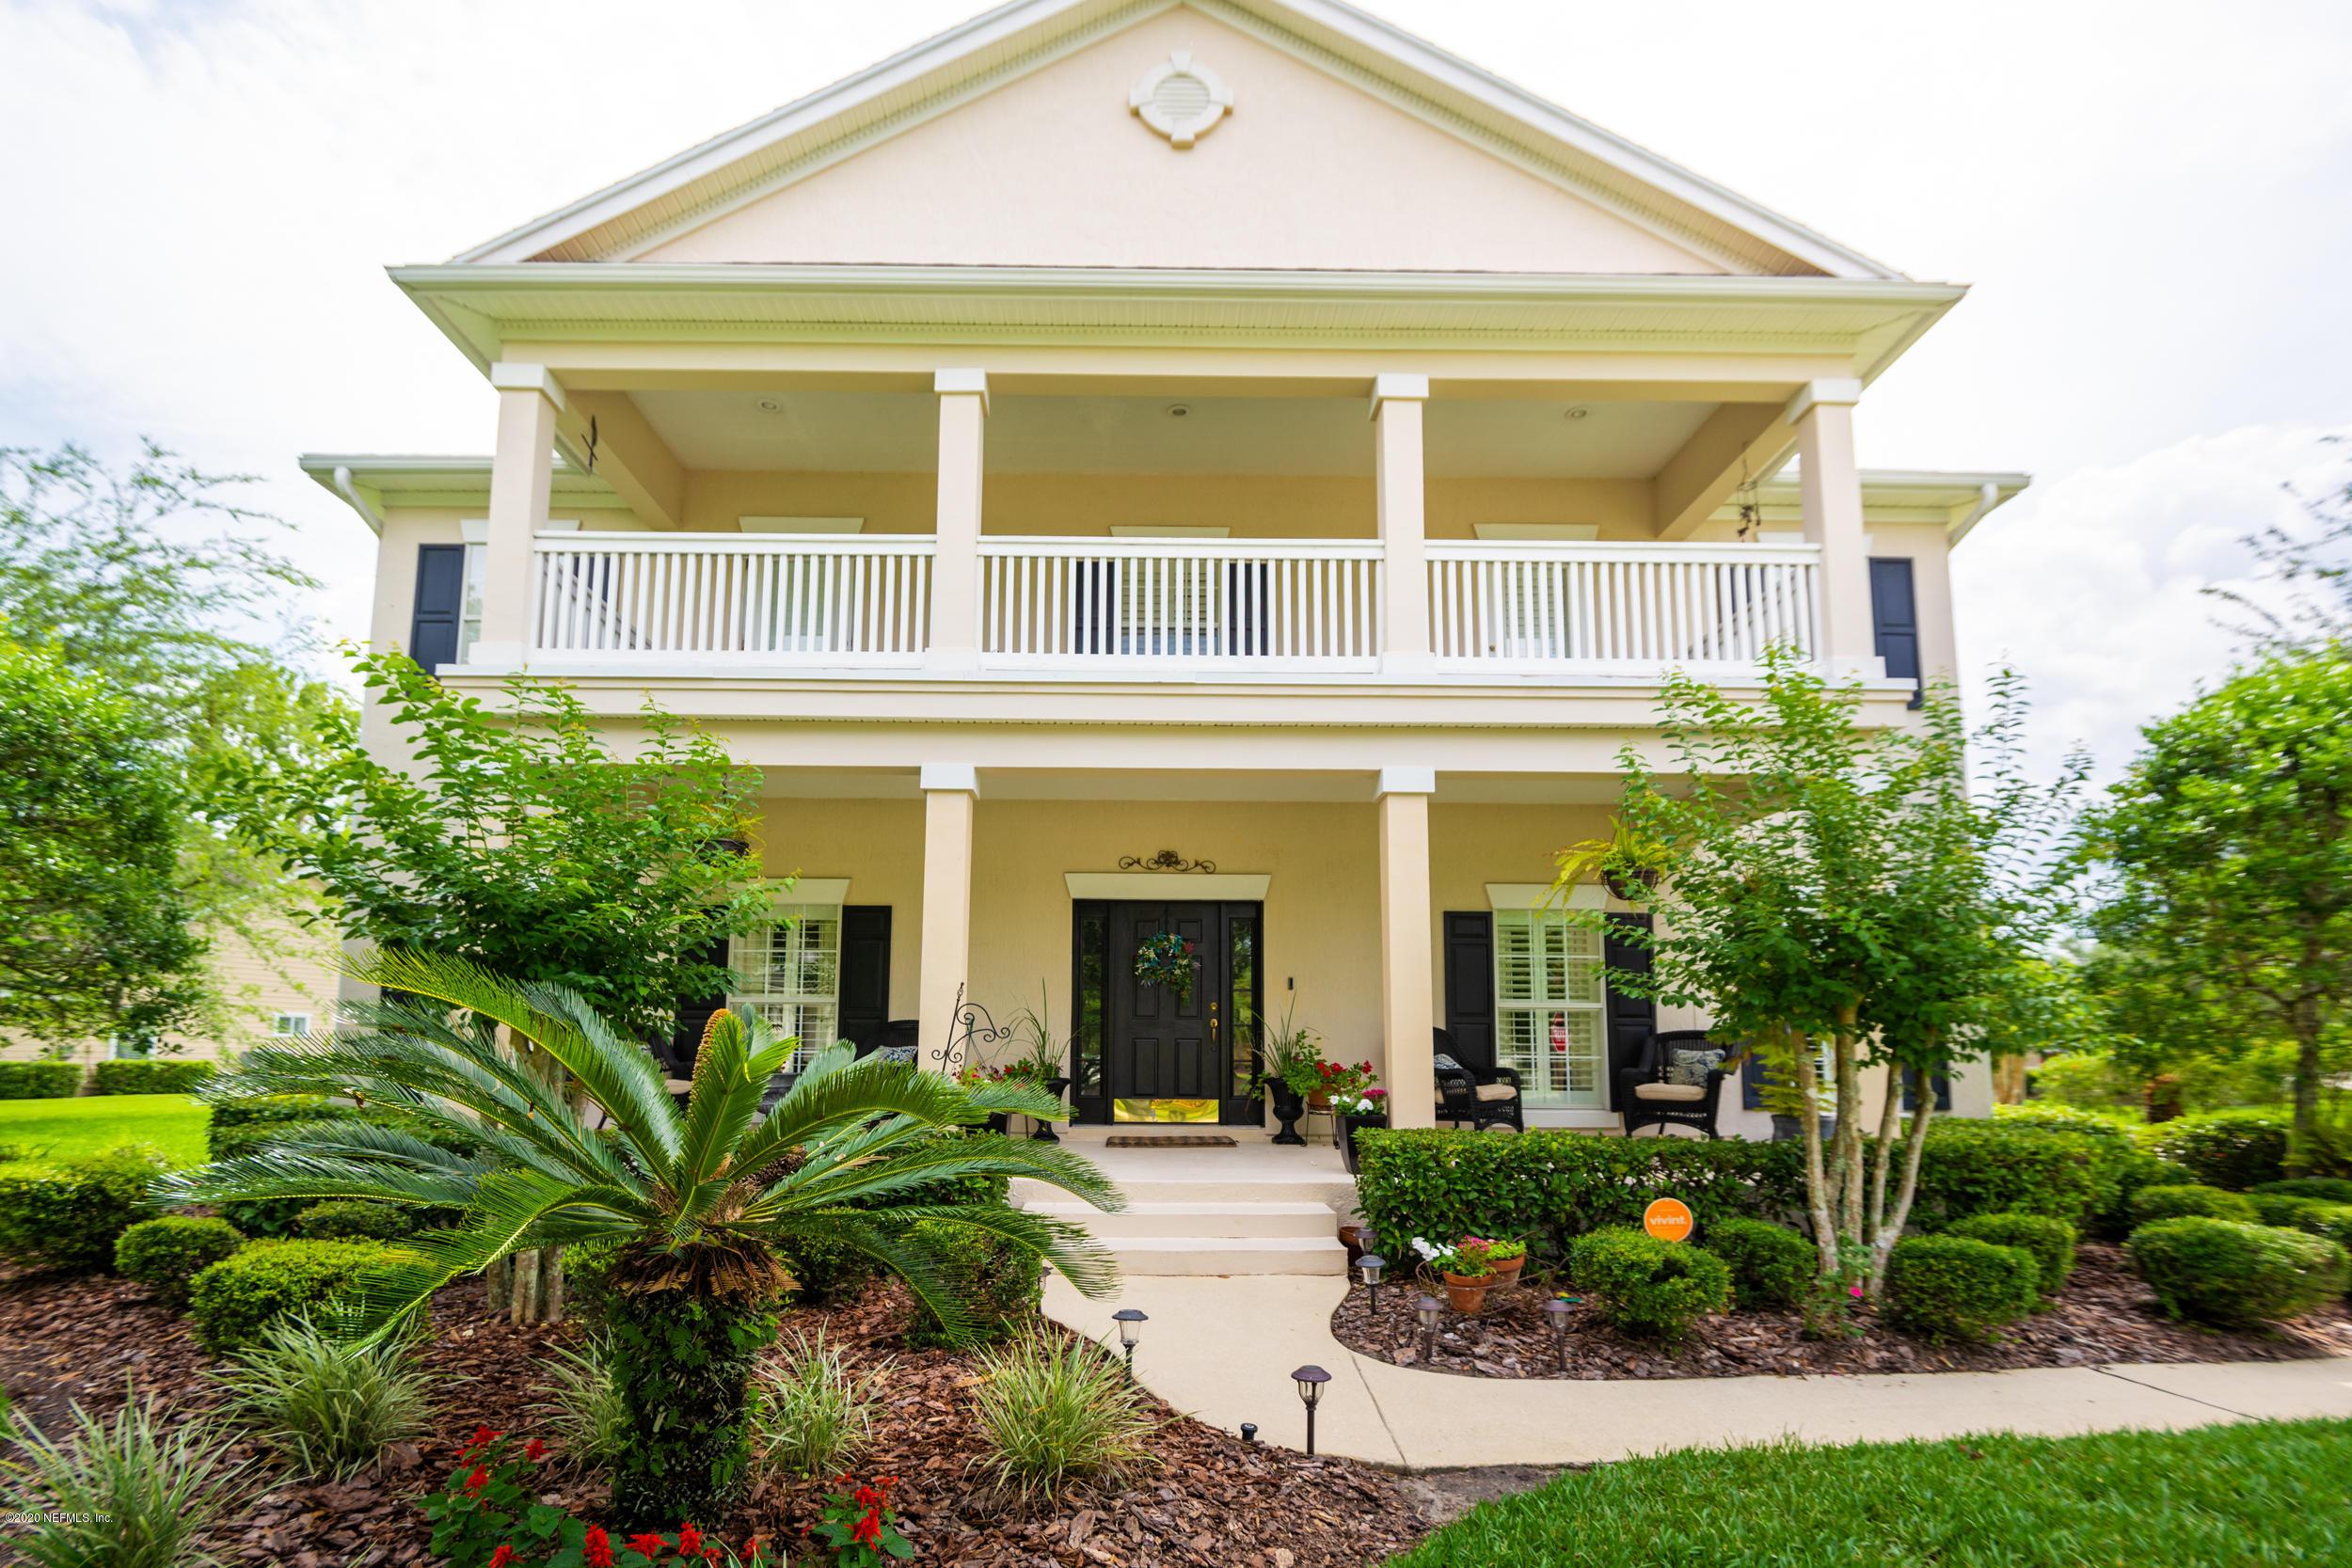 370 SAINT JOHNS GOLF, ST AUGUSTINE, FLORIDA 32092, 5 Bedrooms Bedrooms, ,3 BathroomsBathrooms,Residential,For sale,SAINT JOHNS GOLF,1055590